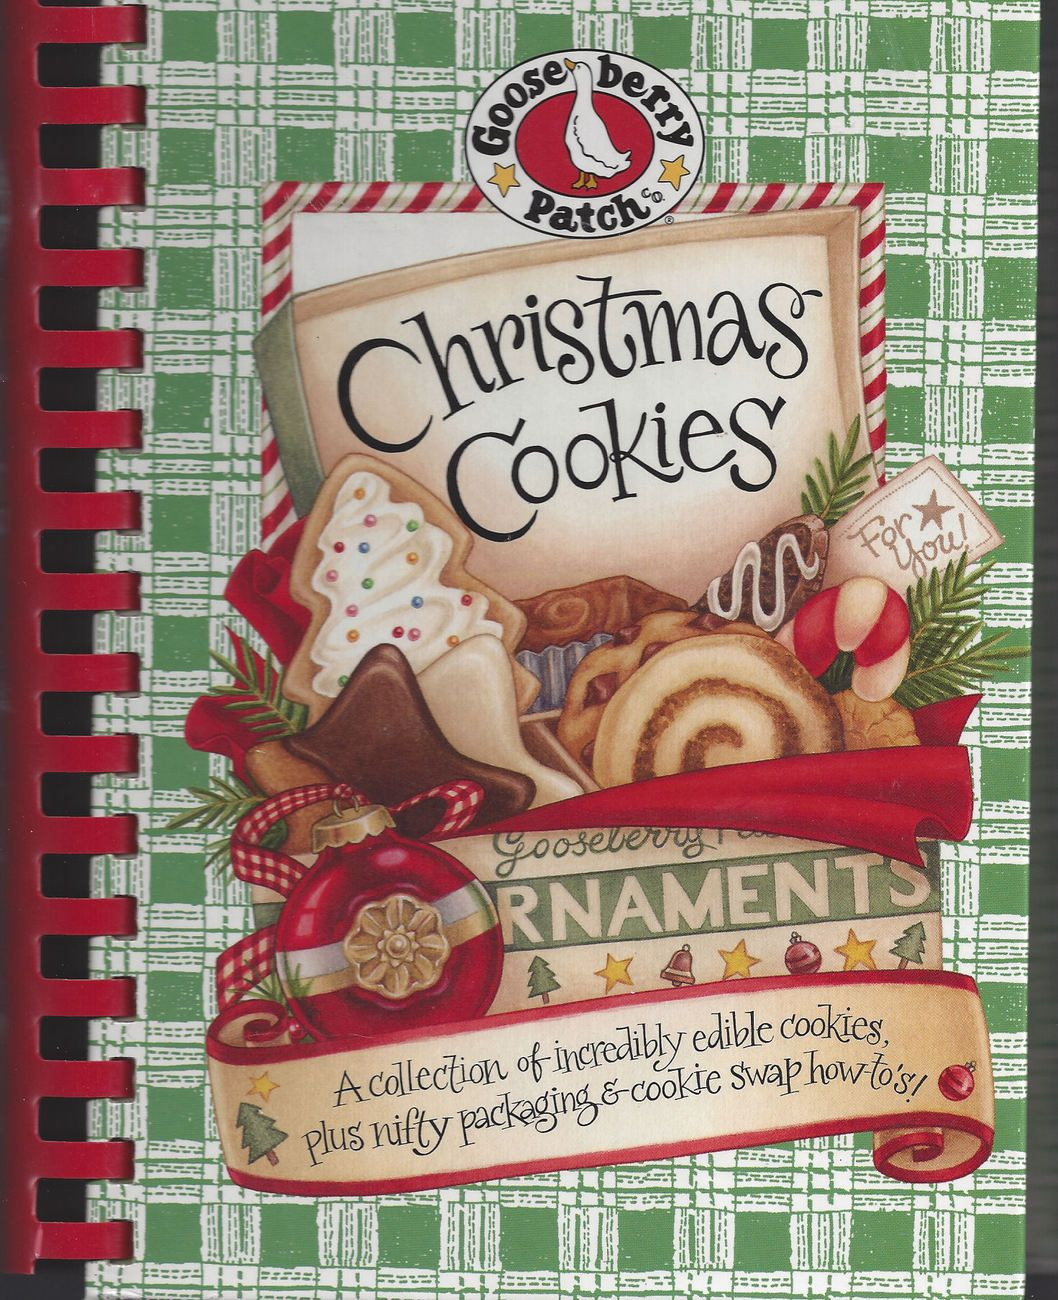 Christmas Cookies Cookbooks  Vintage Hall Pitcher Jug Rayed Heather Pink Rose Gold Trim